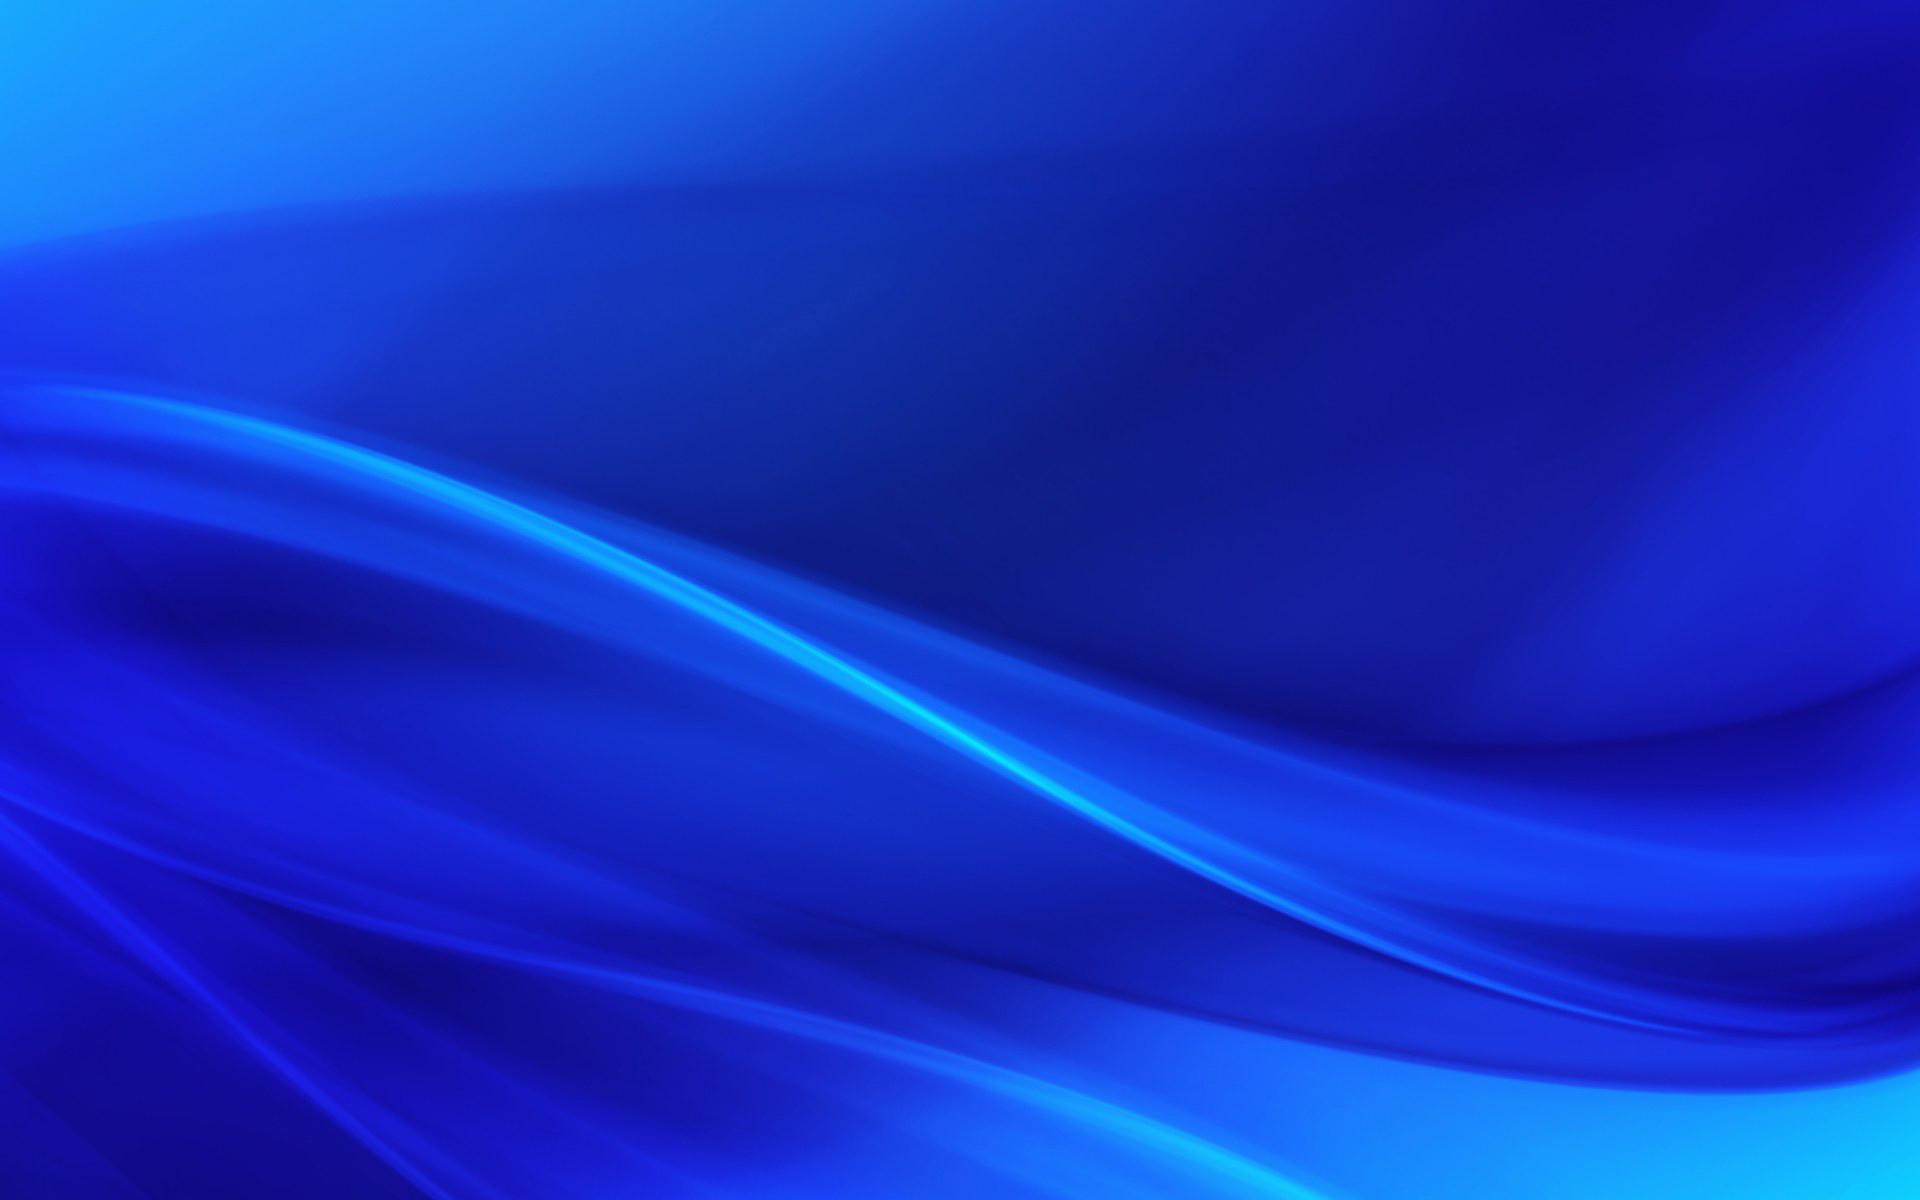 Blue Wave Wallpaper (76+ images)